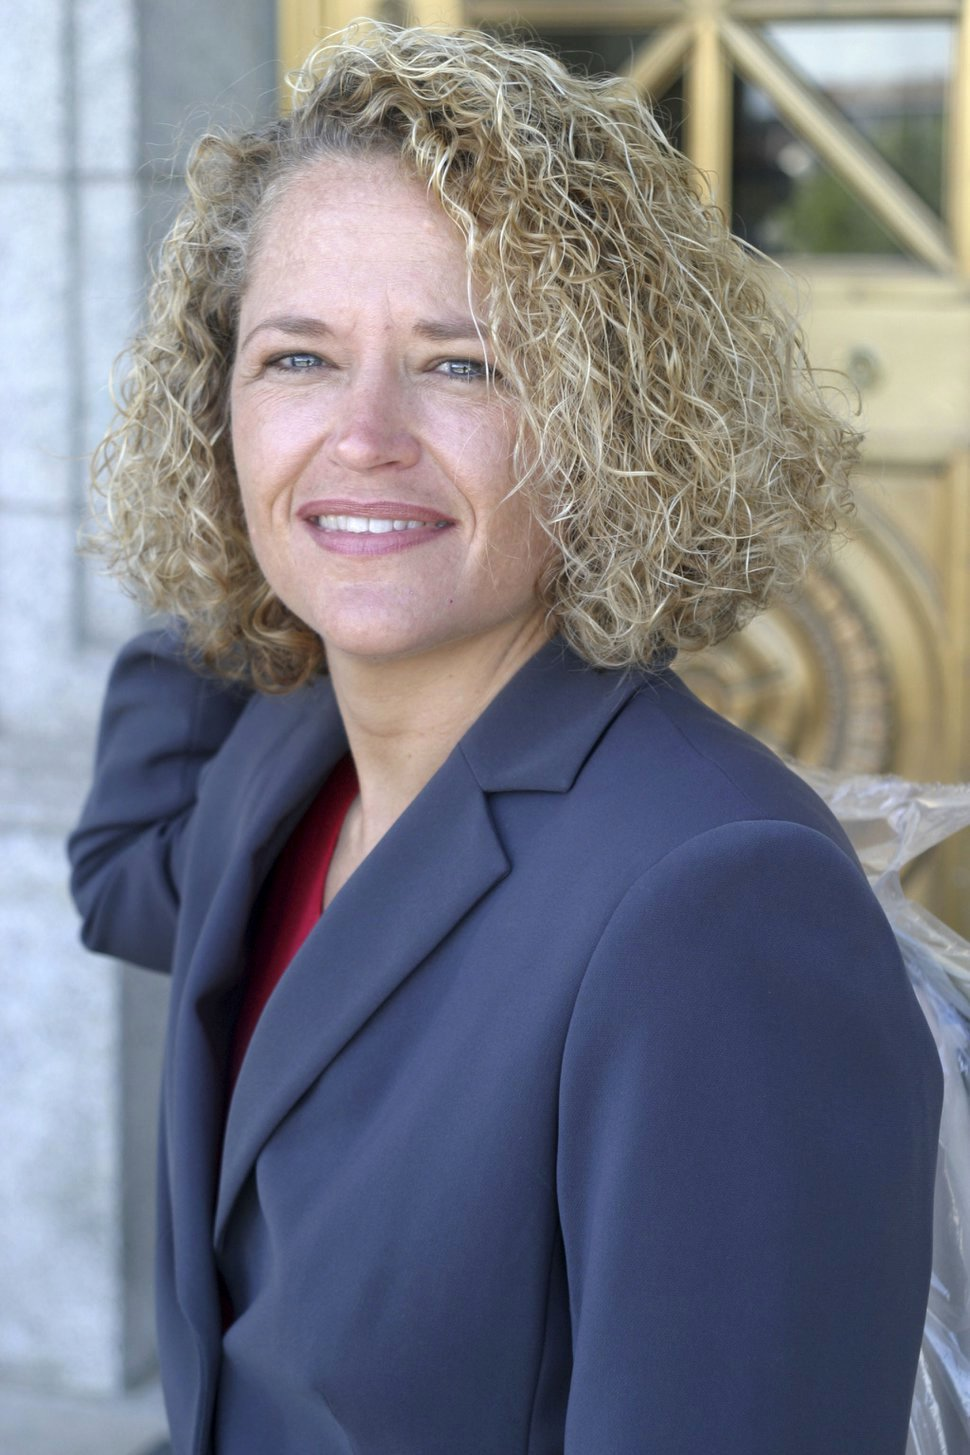 Attention Getter for Homelessness Lovely Pioneer Park Coalition Sponsors Salt Lake City Mayoral